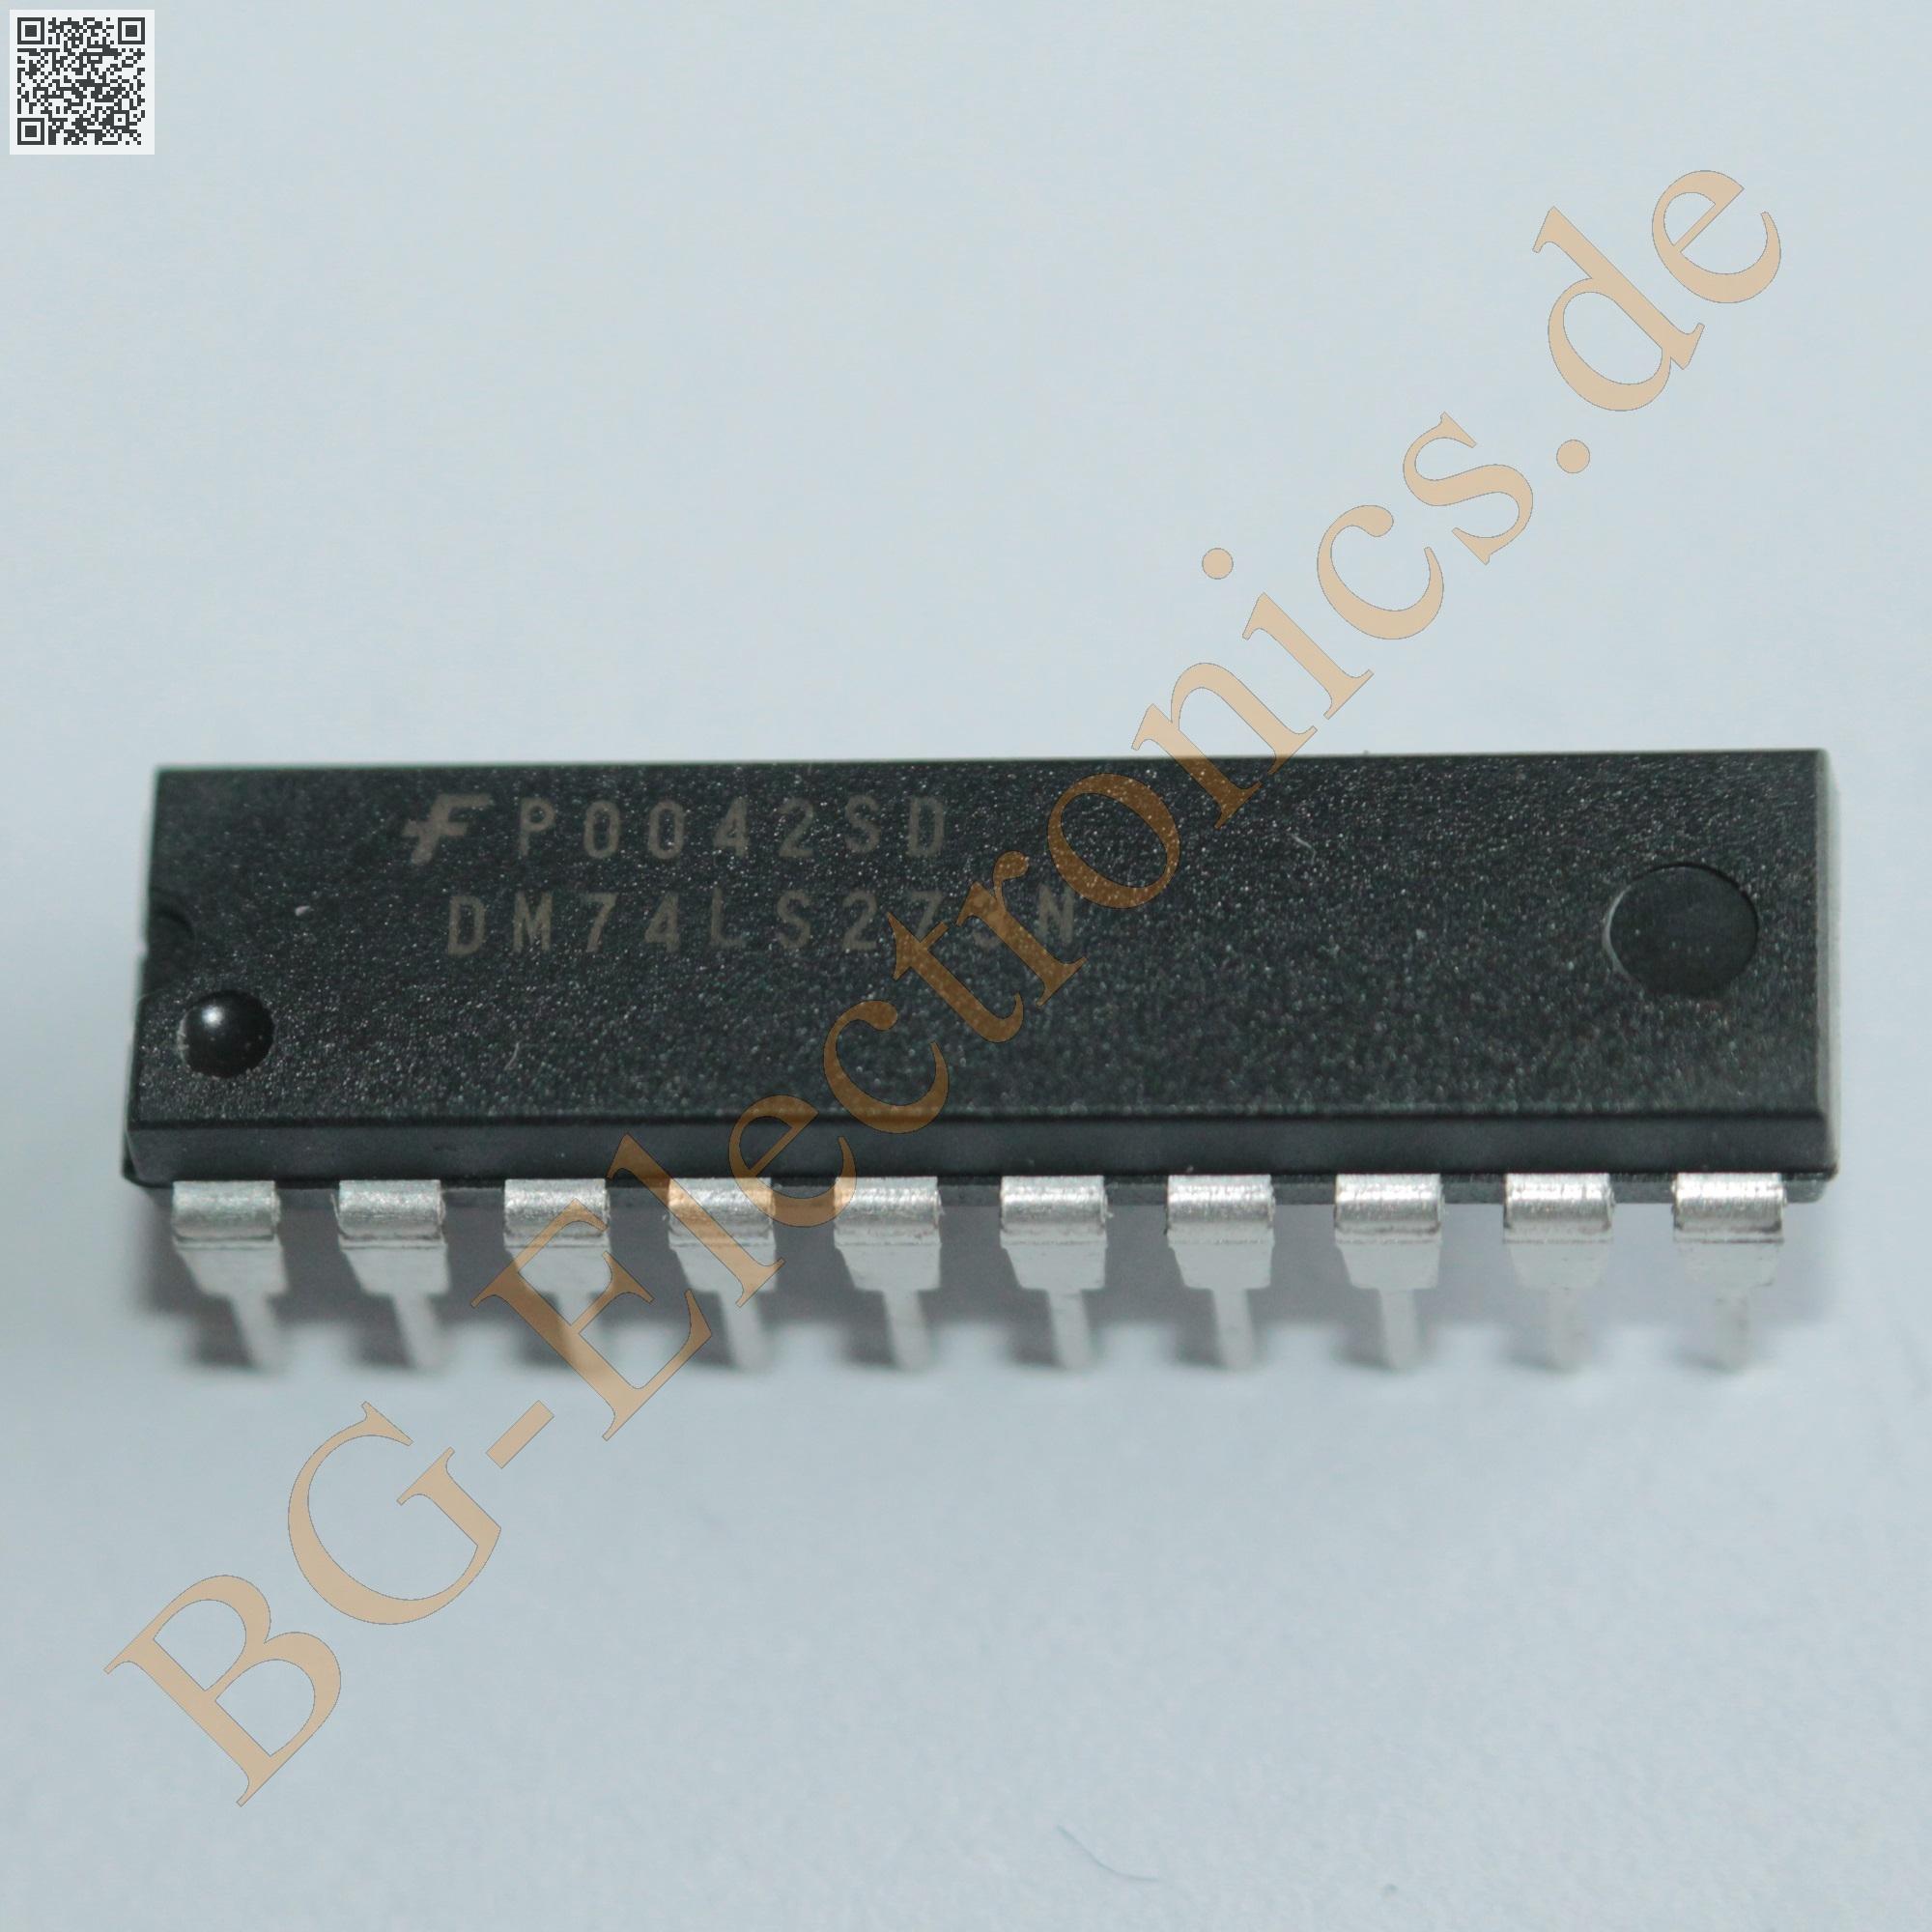 1 x sab8085ah-p 8-bit microprocessor clock generator sy siemens dip-40 1pcs